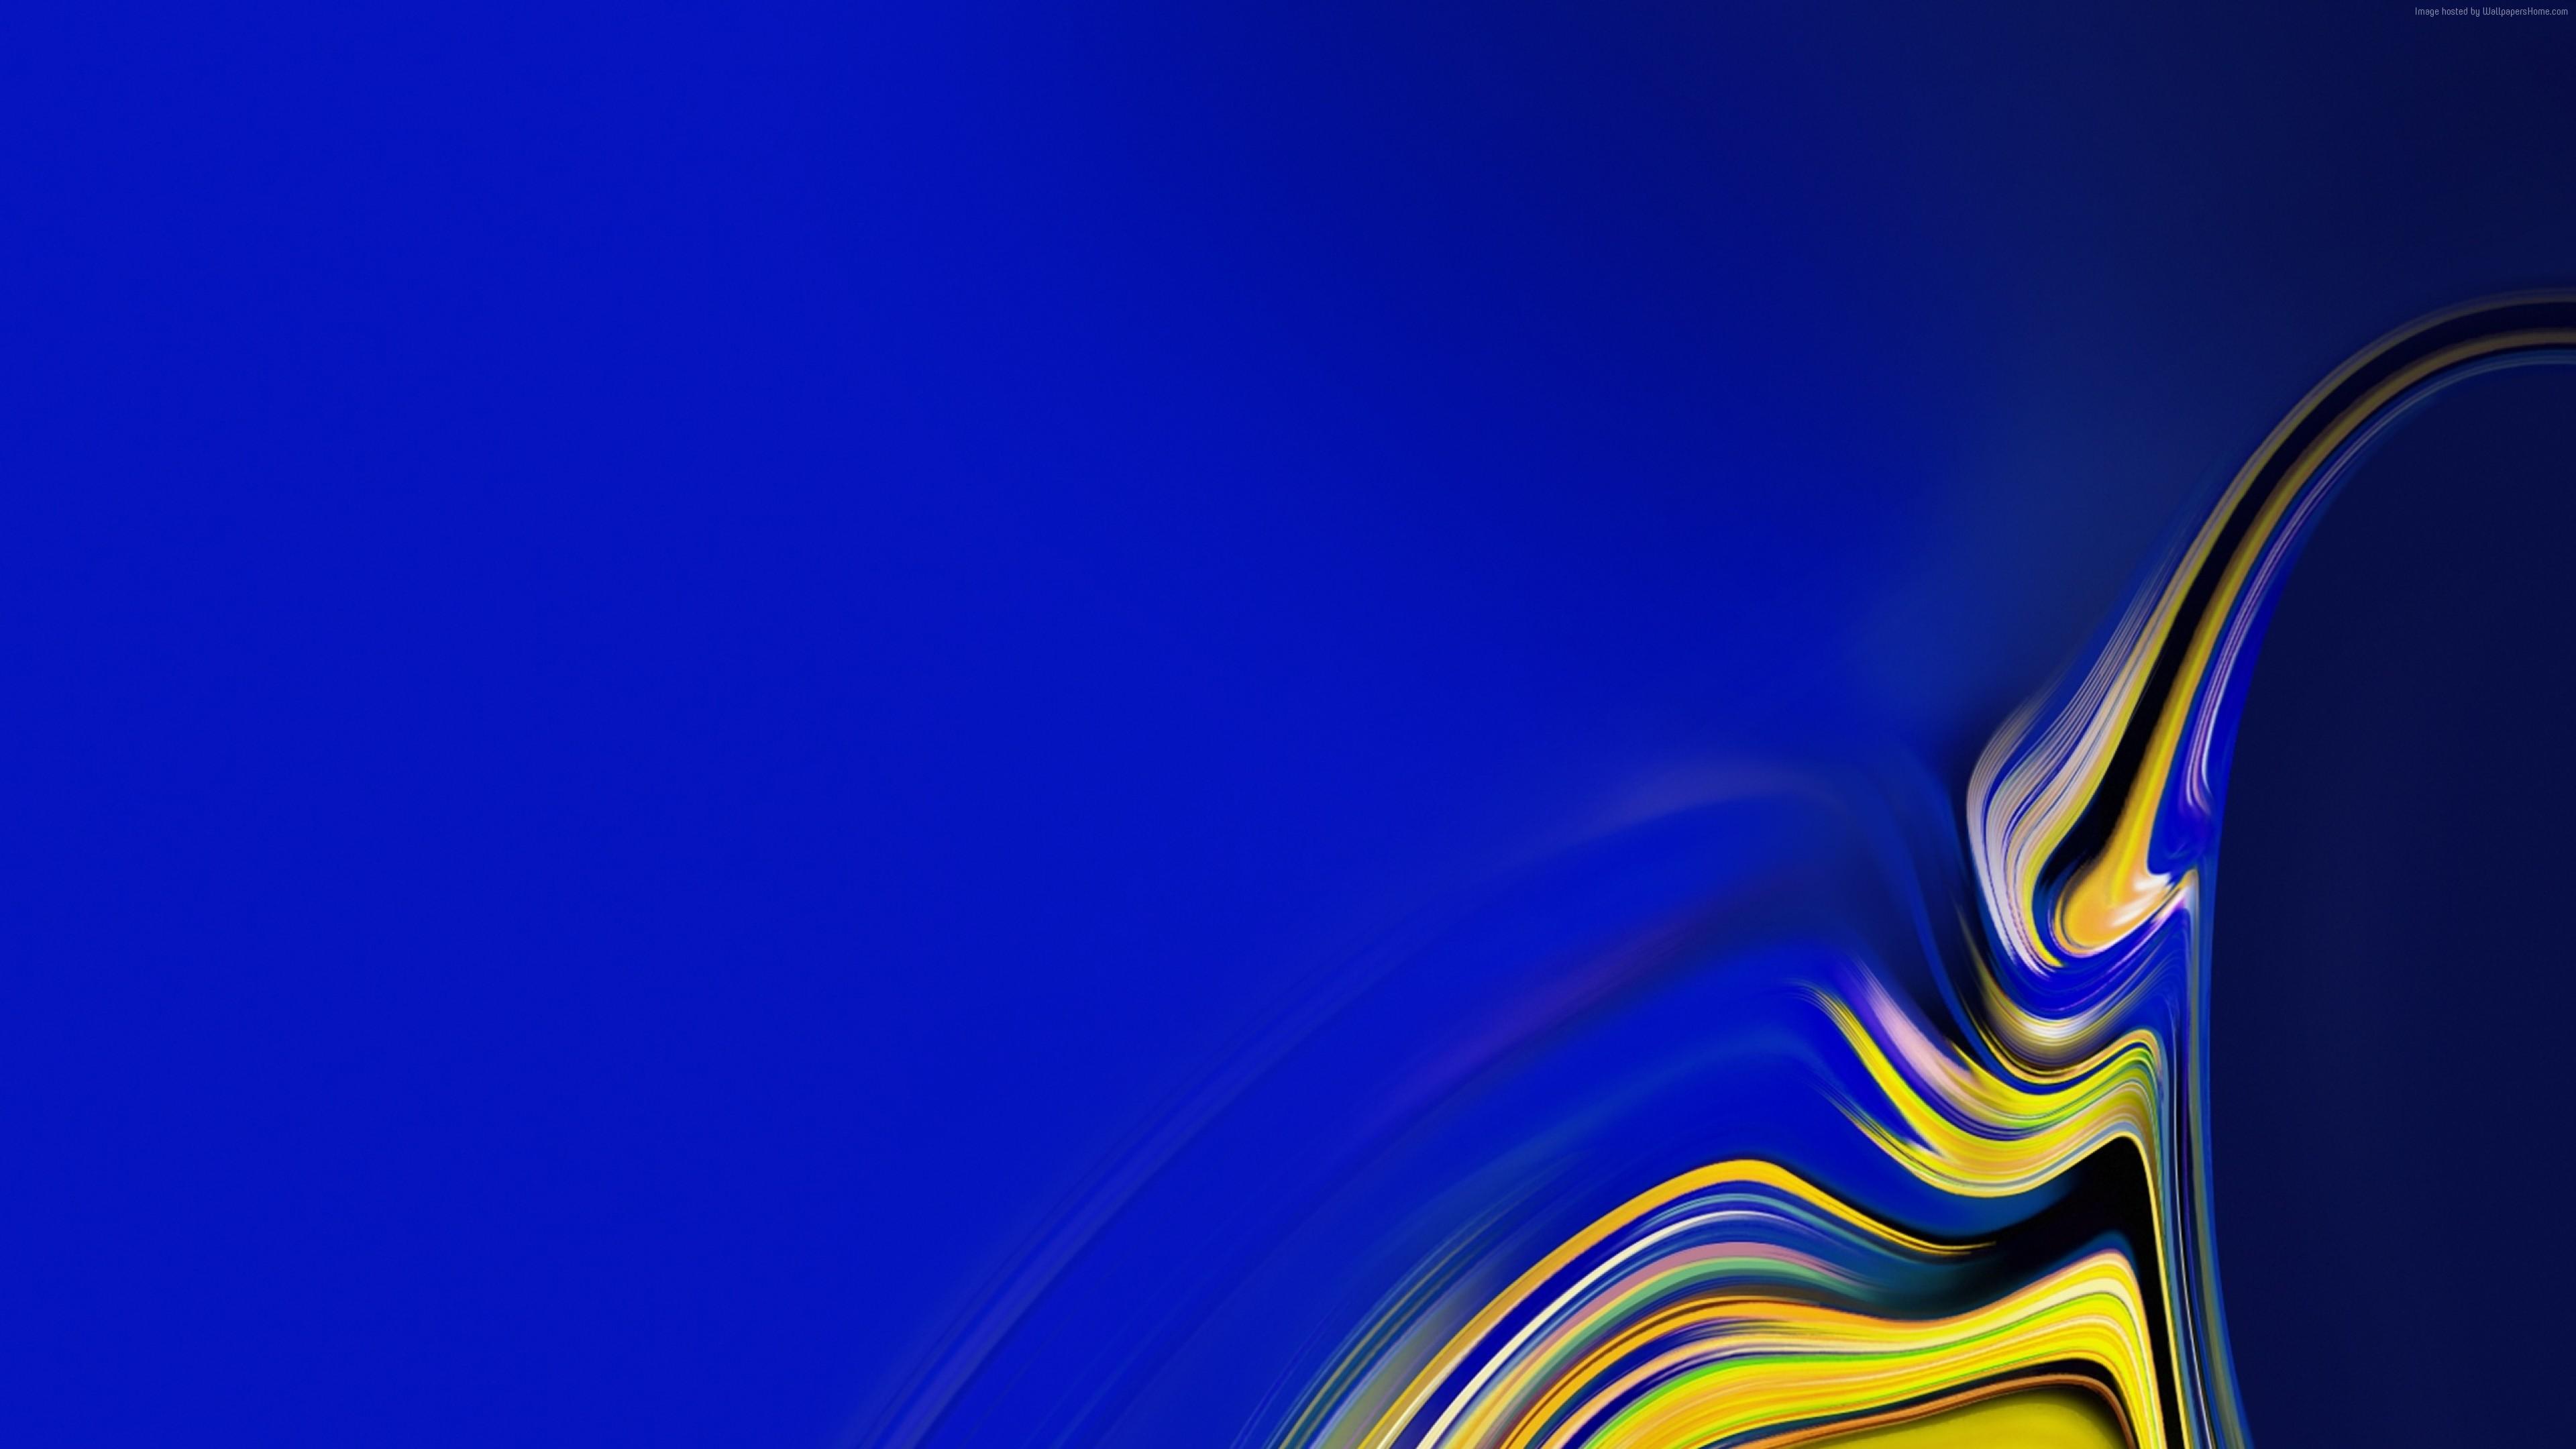 Wallpaper Samsung Galaxy Note 9 Android Samsung Galaxy Note 9 4k Wallpapers Pc 3840x2160 Wallpaper Teahub Io